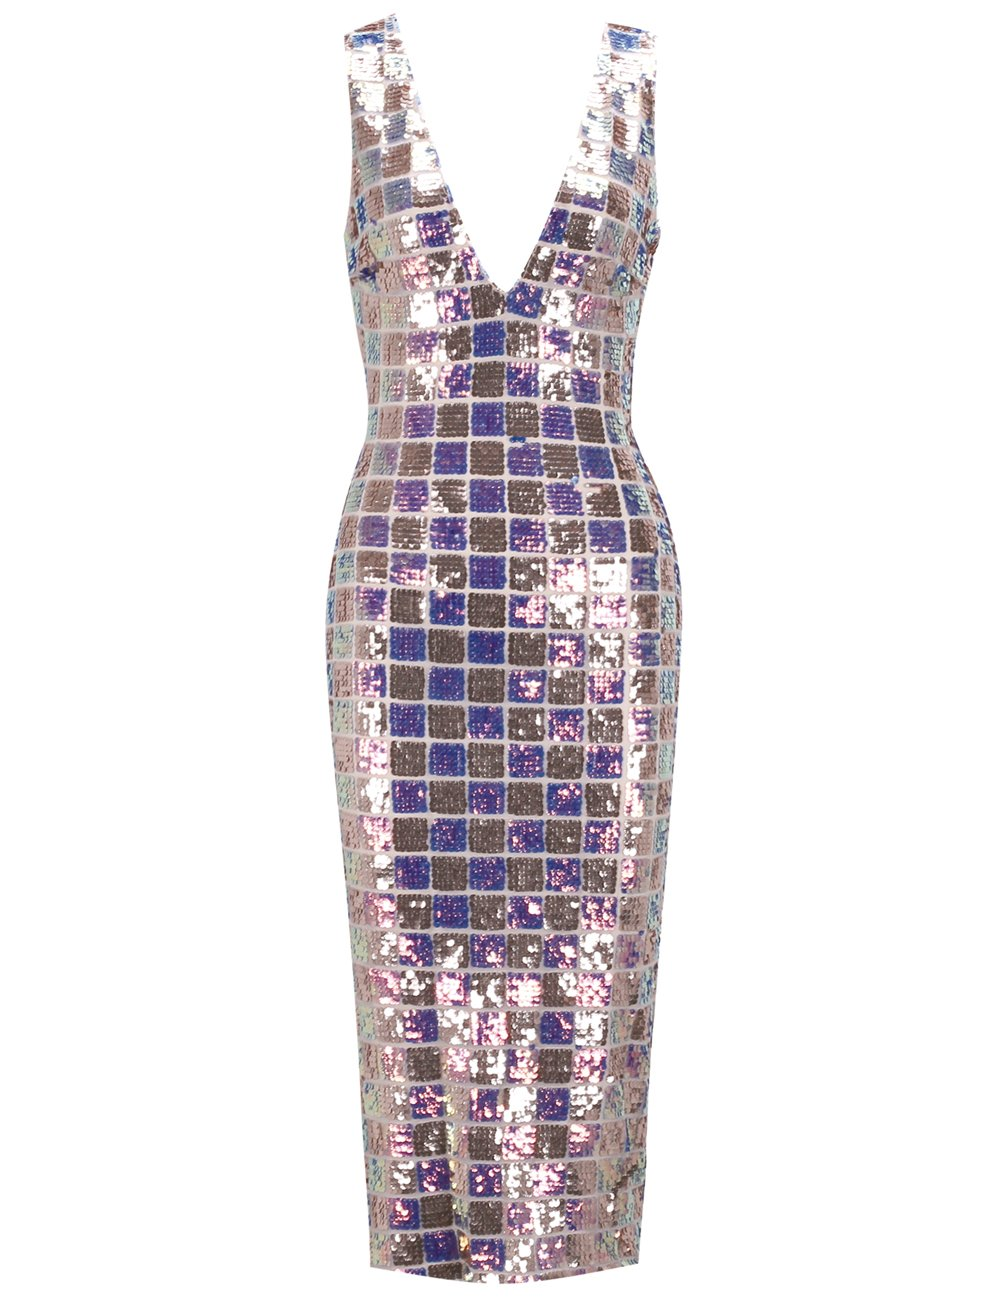 UONBOX Women's Sexy Deep V Neck Sequin Glitter Bodycon Stretchy Midi Party Dress (Rainbow, M)